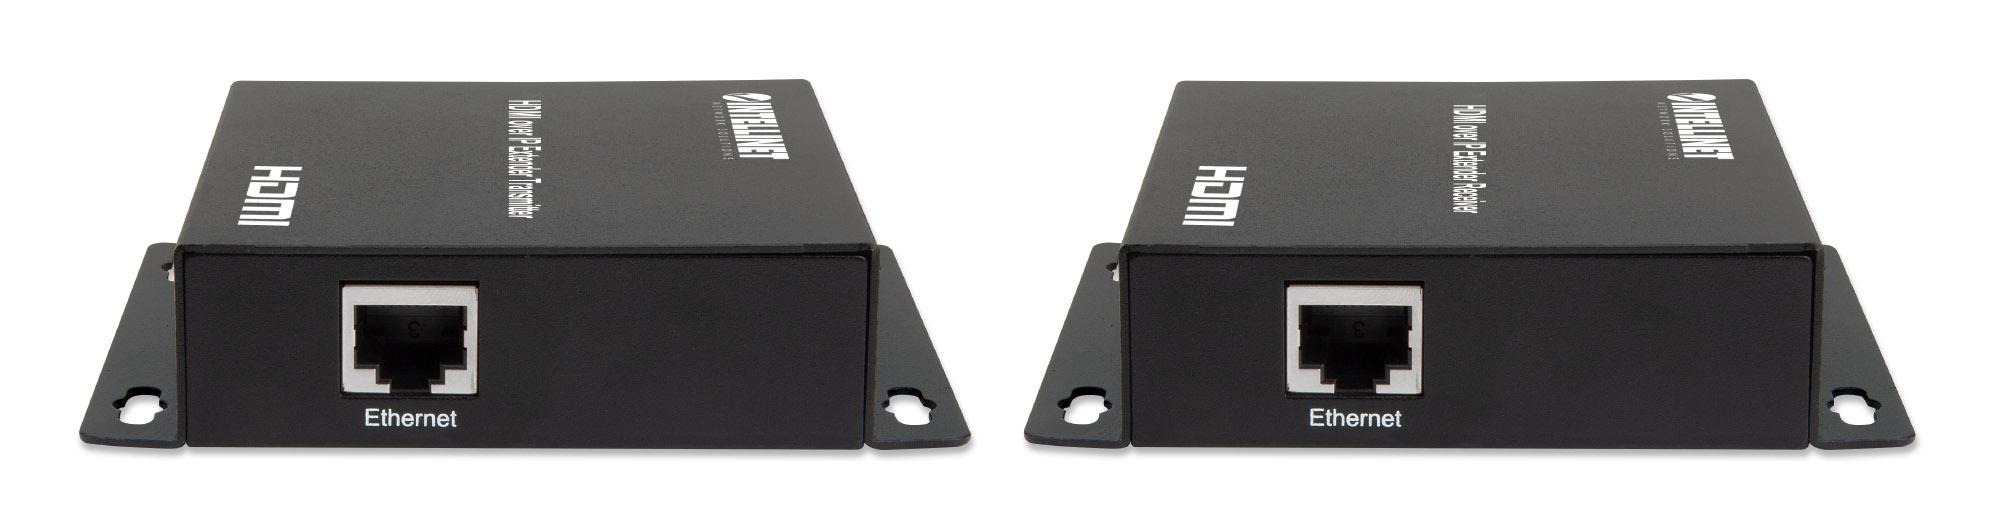 HDMI over IP Extender Kit